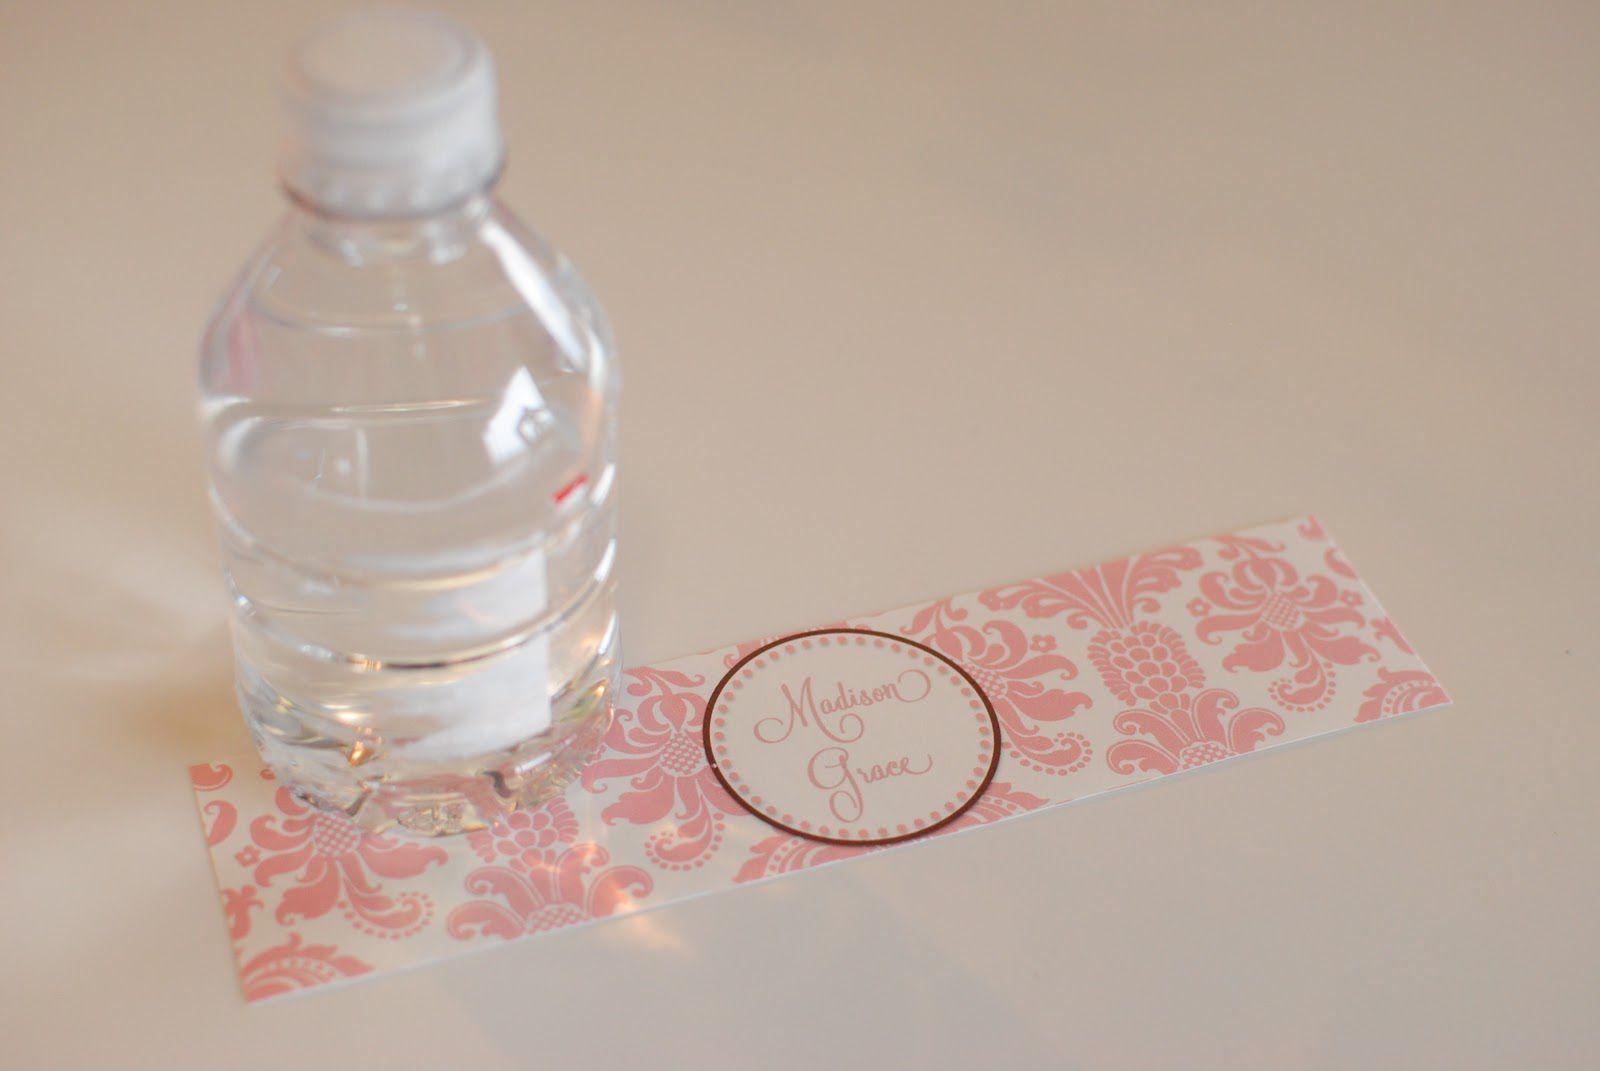 006 Striking Water Bottle Label Template Free Inspiration  Word Superhero PhotoshopFull